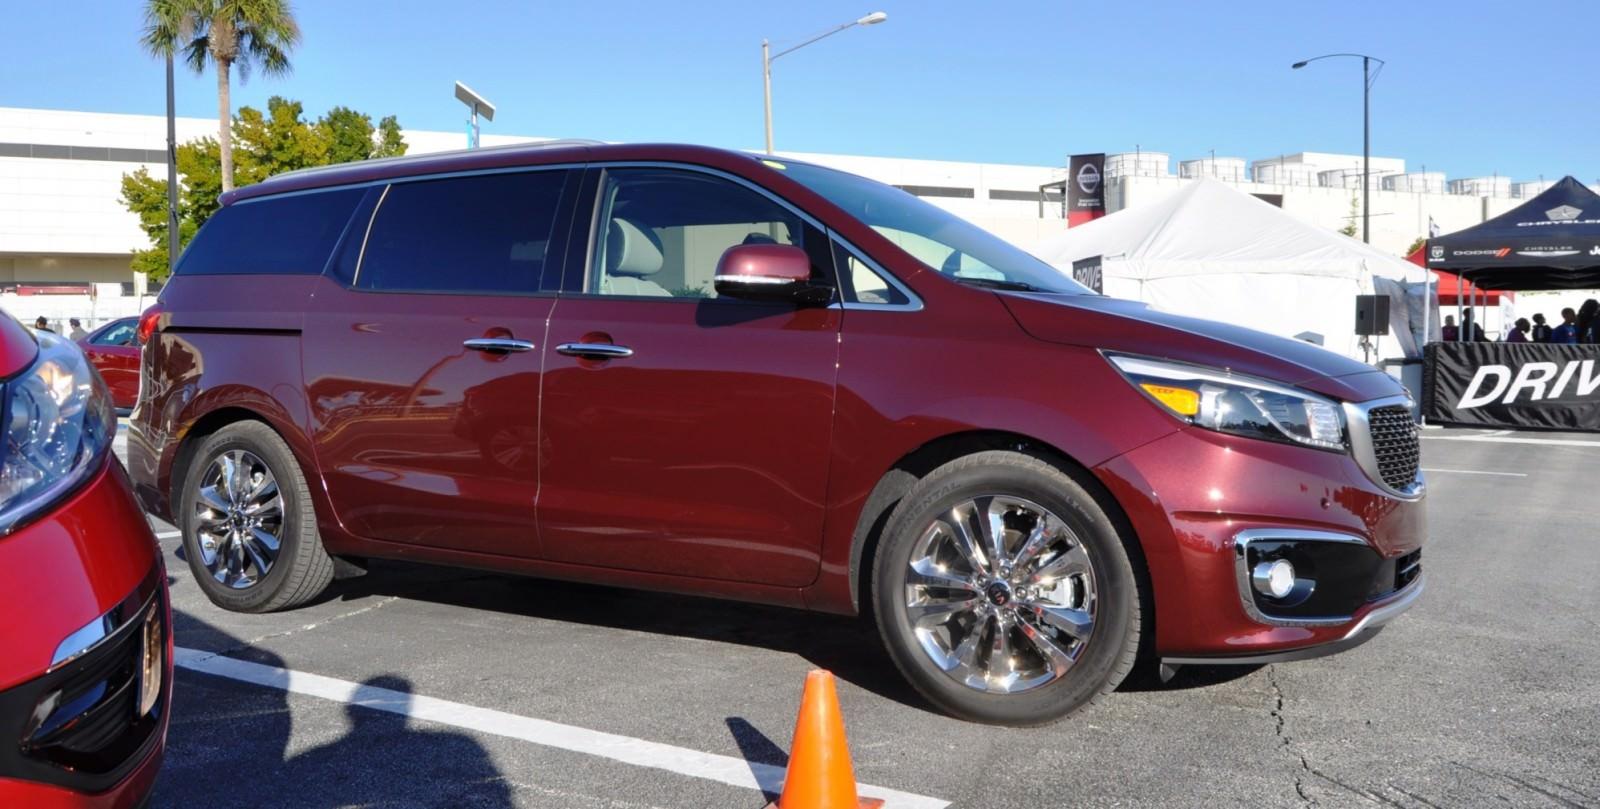 2015 kia sedona sxl at 2014 new york auto show car